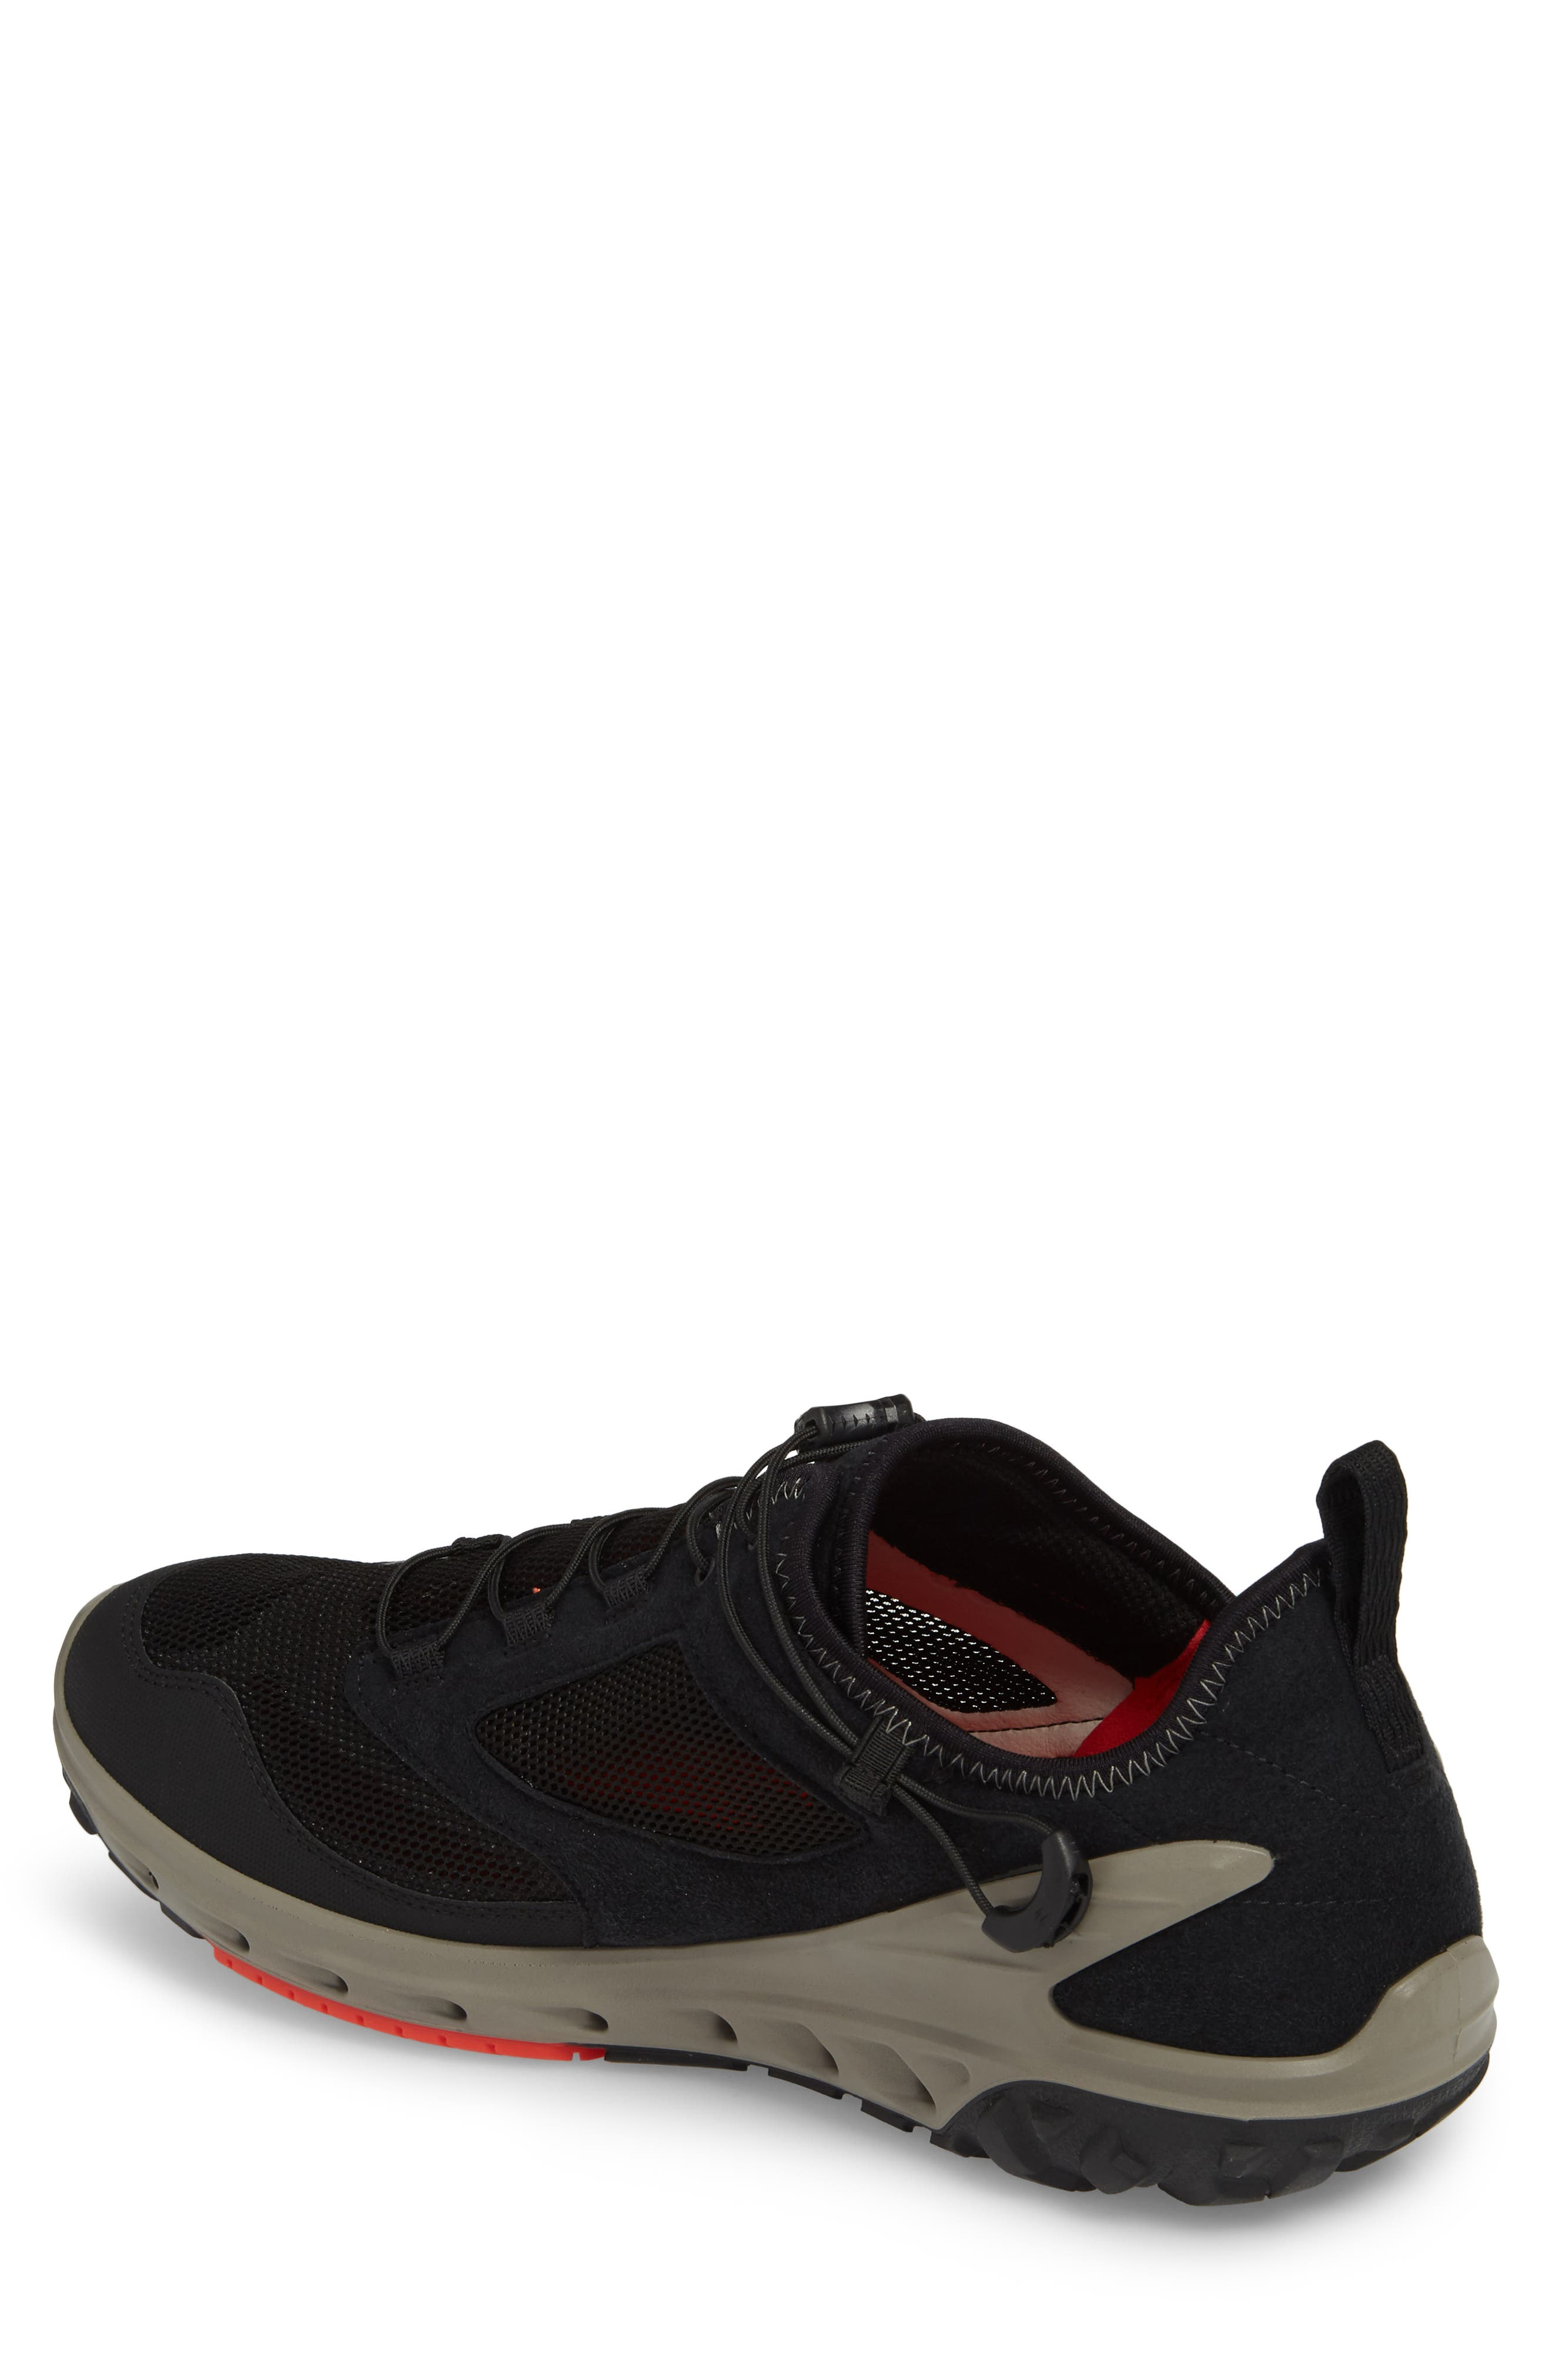 Biom Venture Sneaker,                             Alternate thumbnail 2, color,                             Black Leather